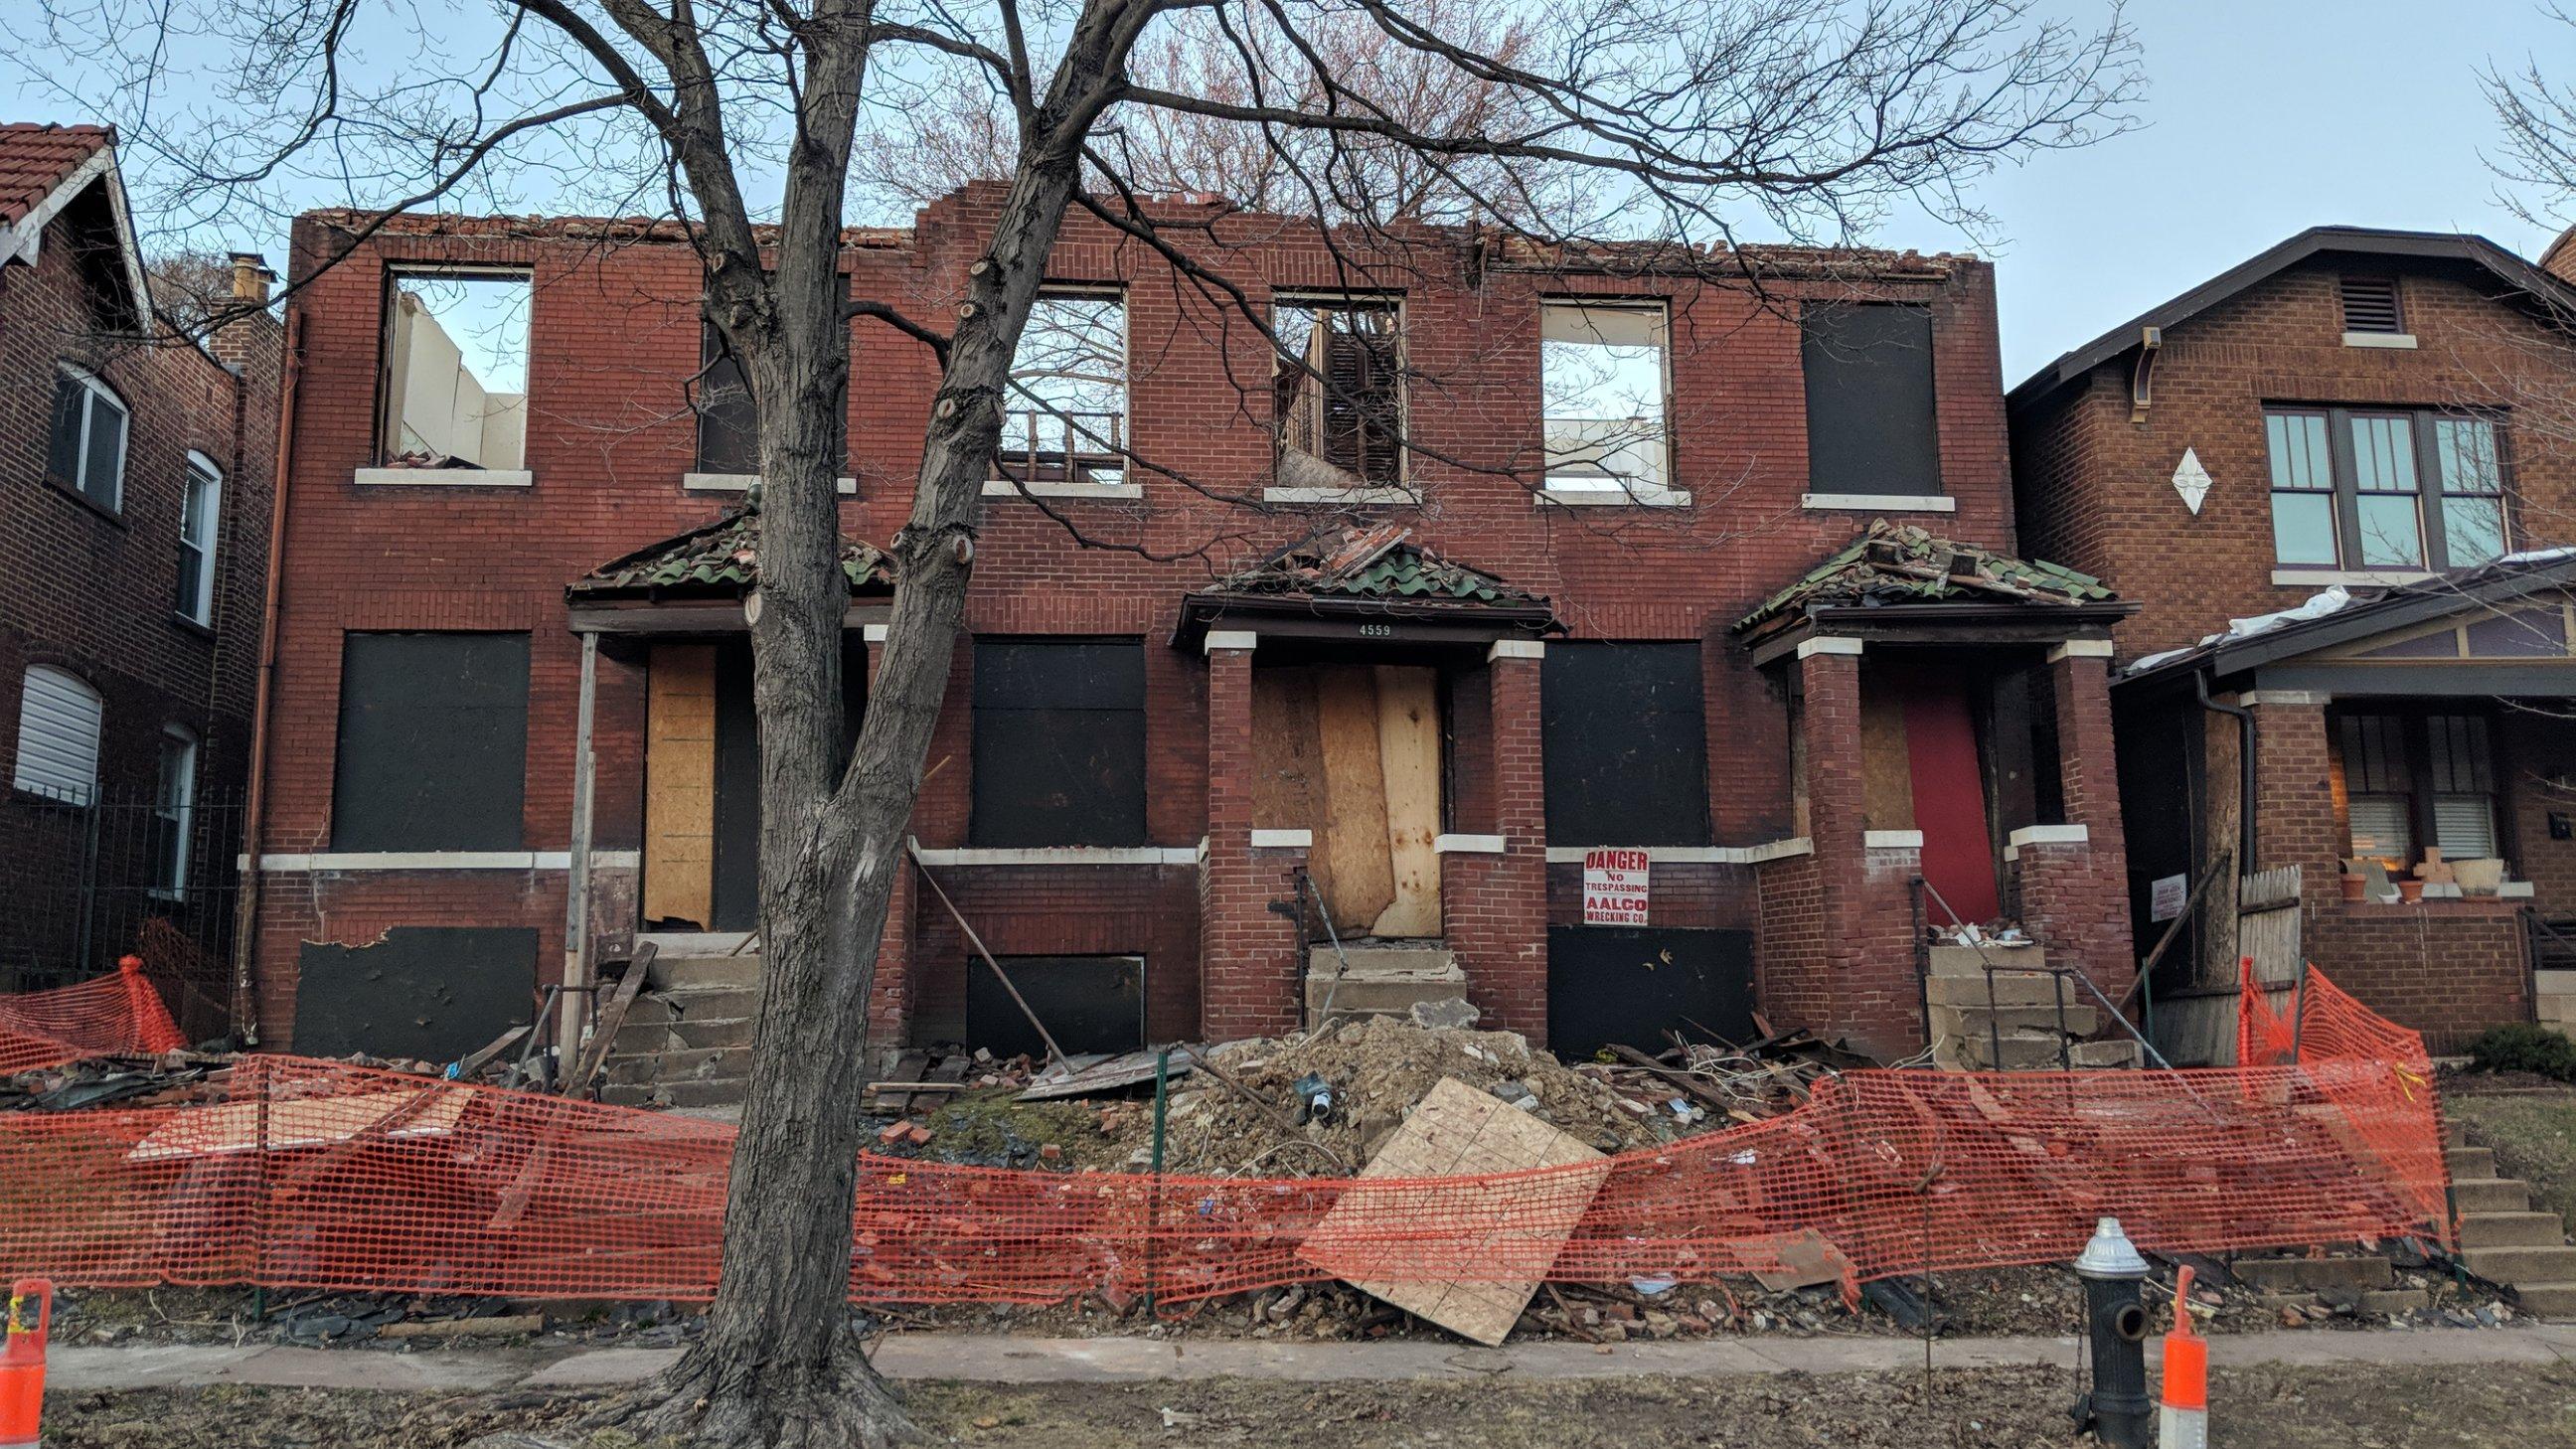 Drury's Demolition by Neglect in FPSE